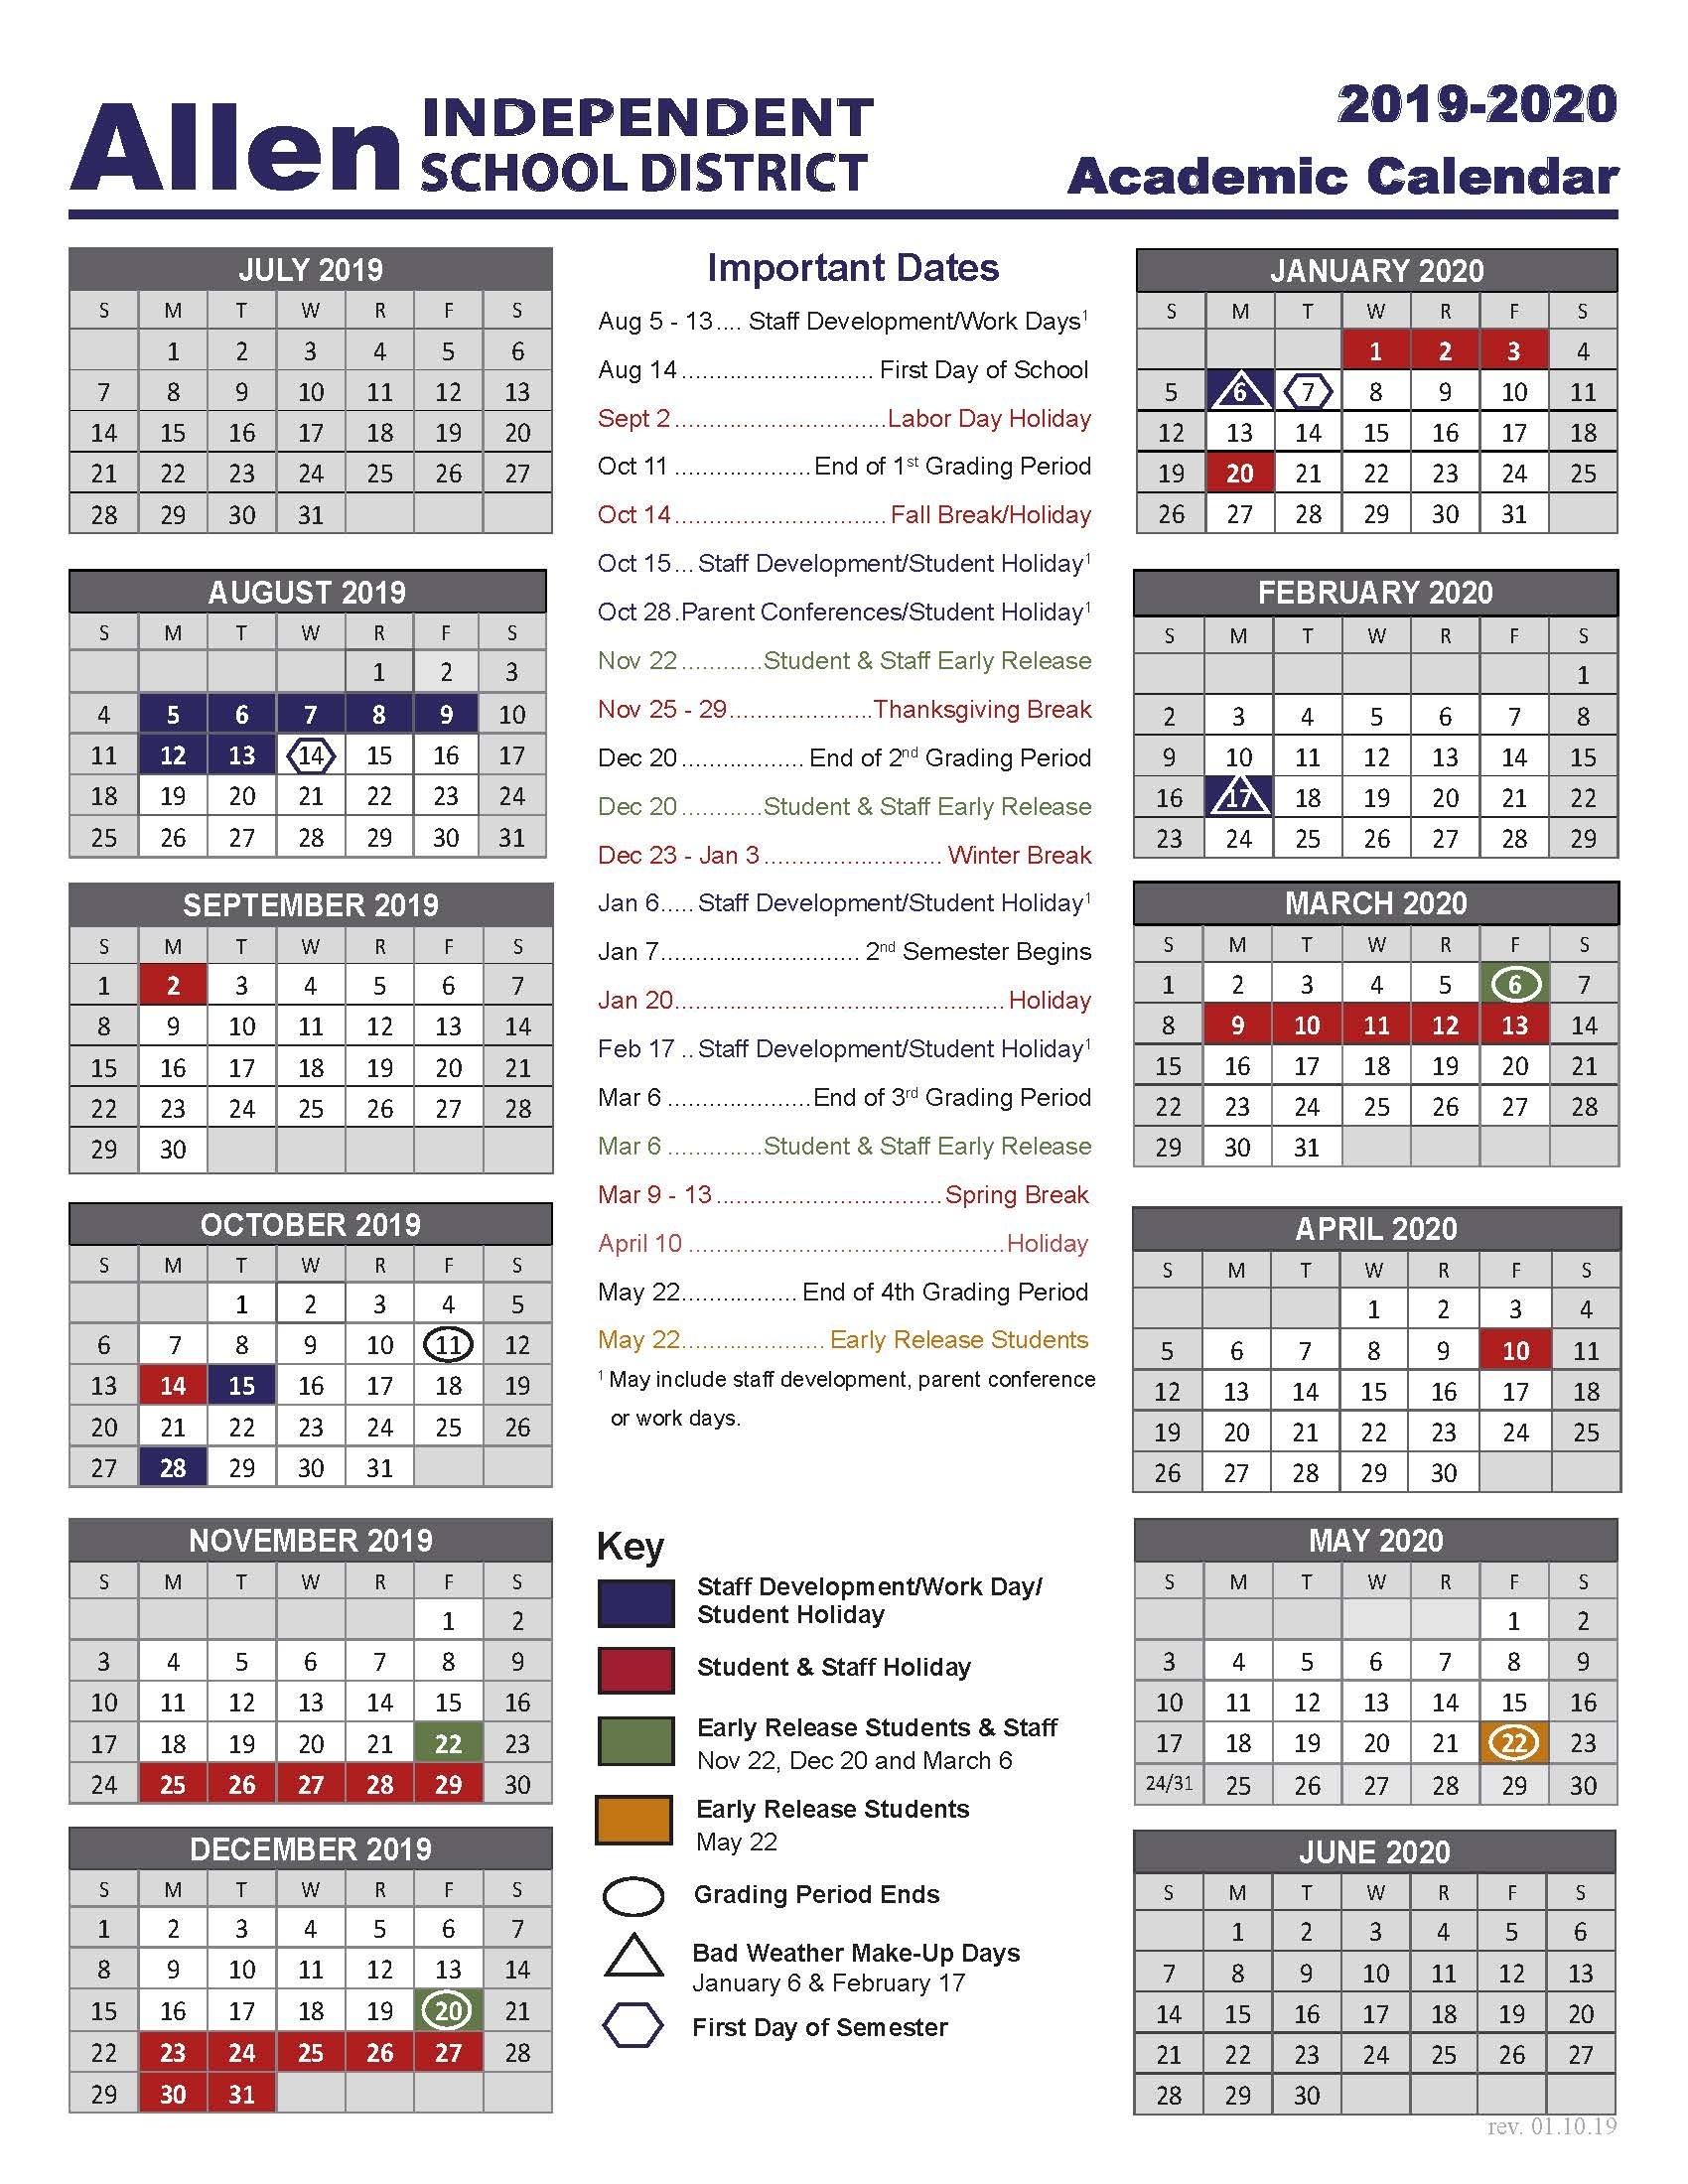 Academic School Year Calendar / 2019-2020 Academic School Calendar Perky Anderson 2 School Calendar